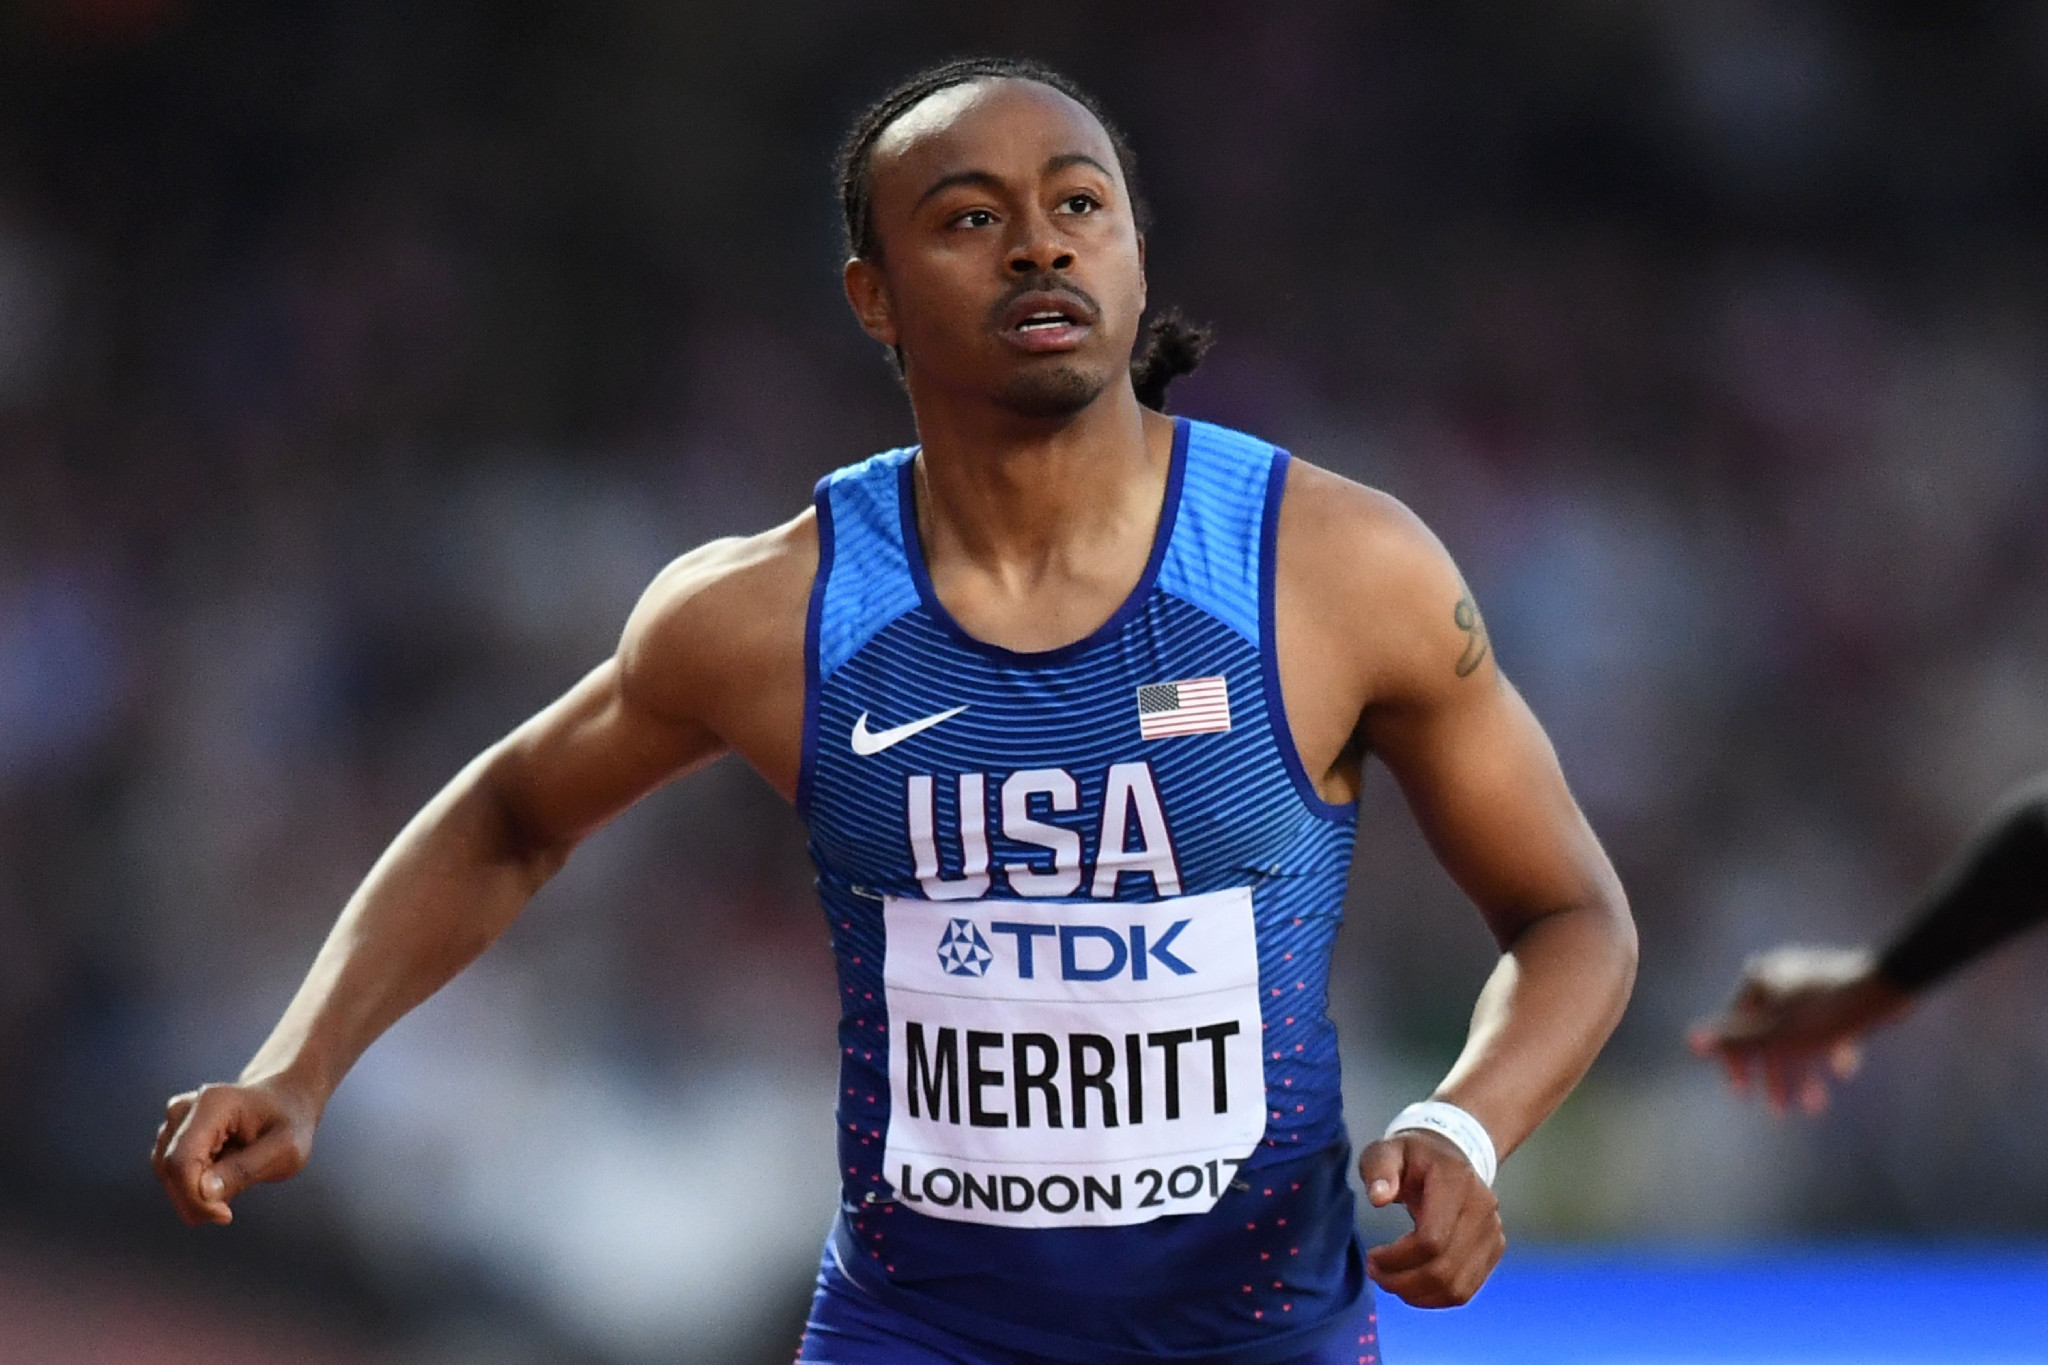 Olympic hurdles champion Merritt eyes Tokyo 2020 as his last Games